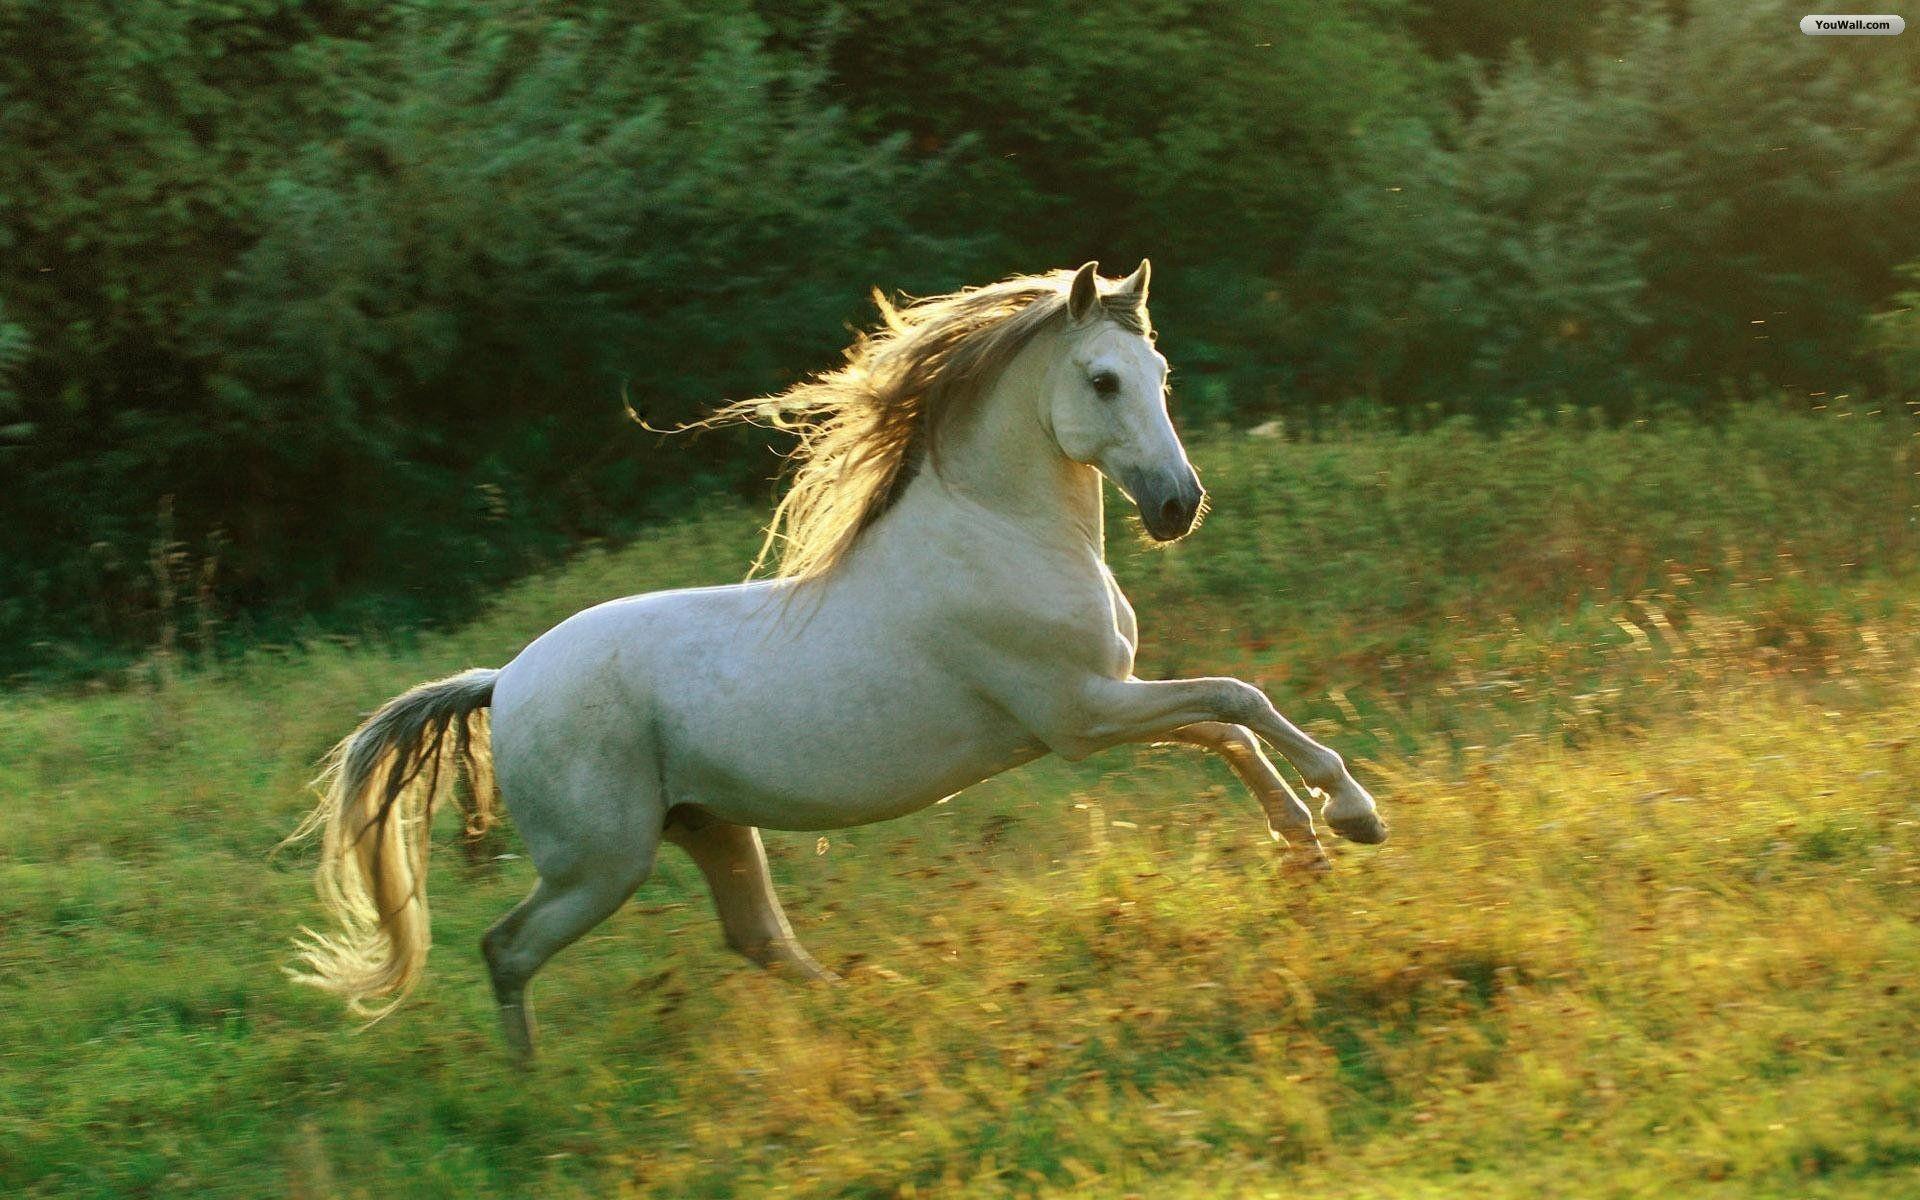 Res: 1920x1200, horse wallpaper hd 1920×1080 Horse Wallpaper Hd (48 Wallpapers) | Adorable  Wallpapers